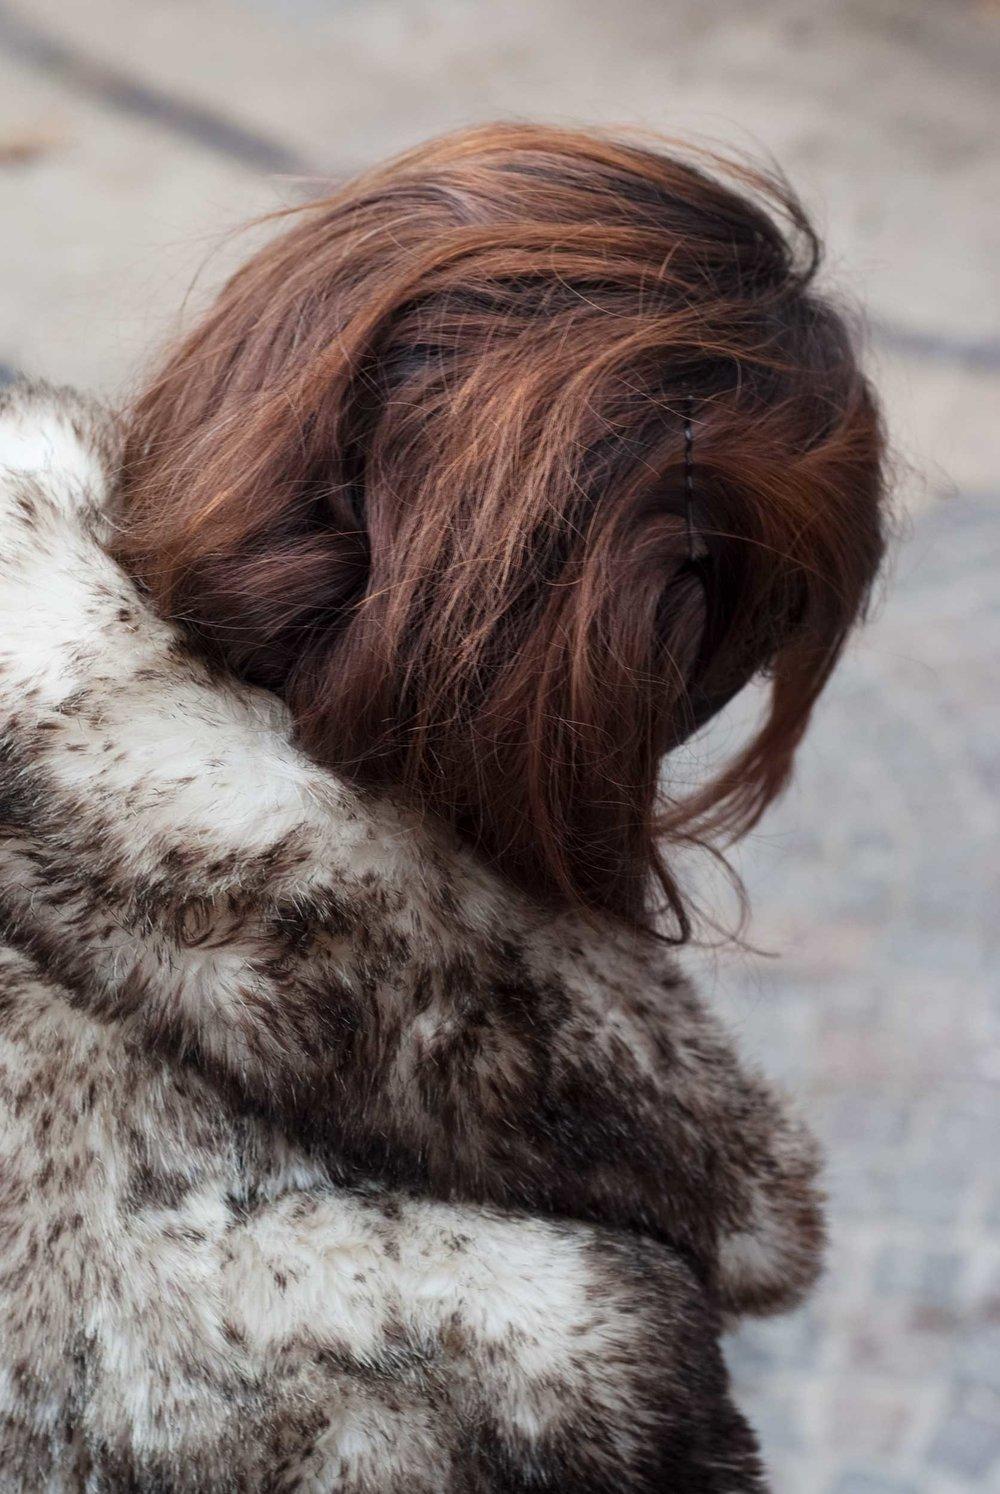 Head and Coat